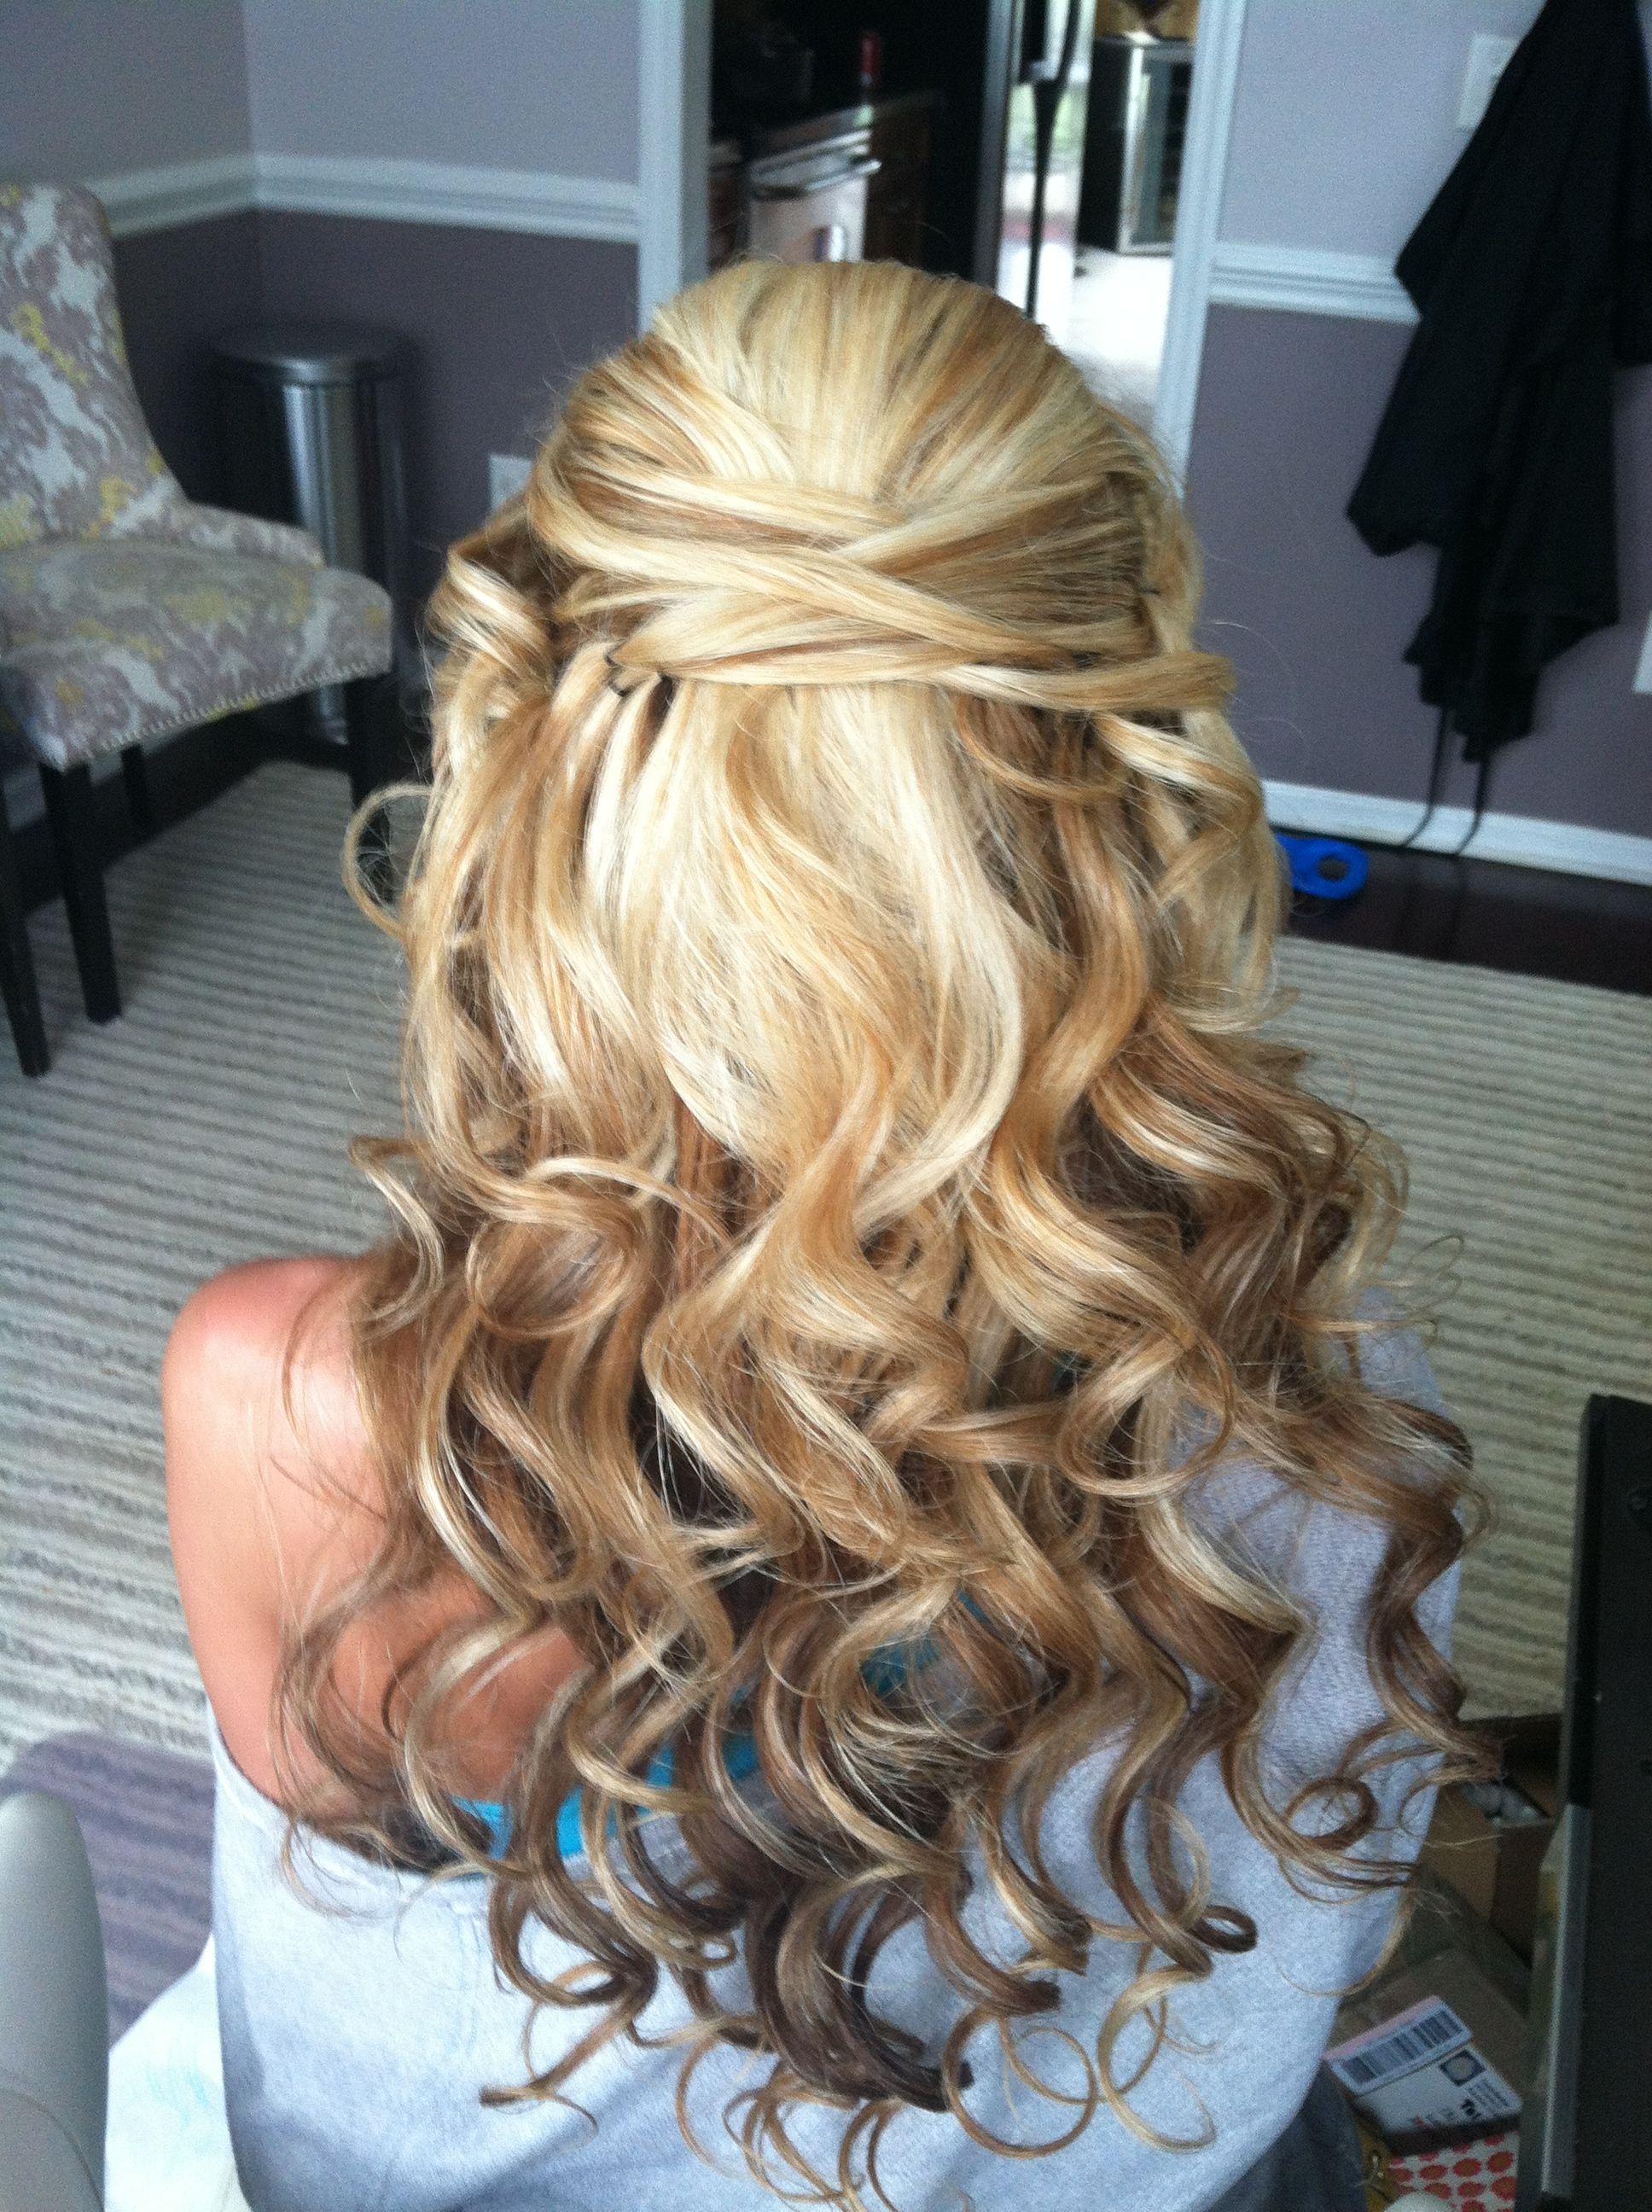 love half up half down curls. and i love the cris cross hair